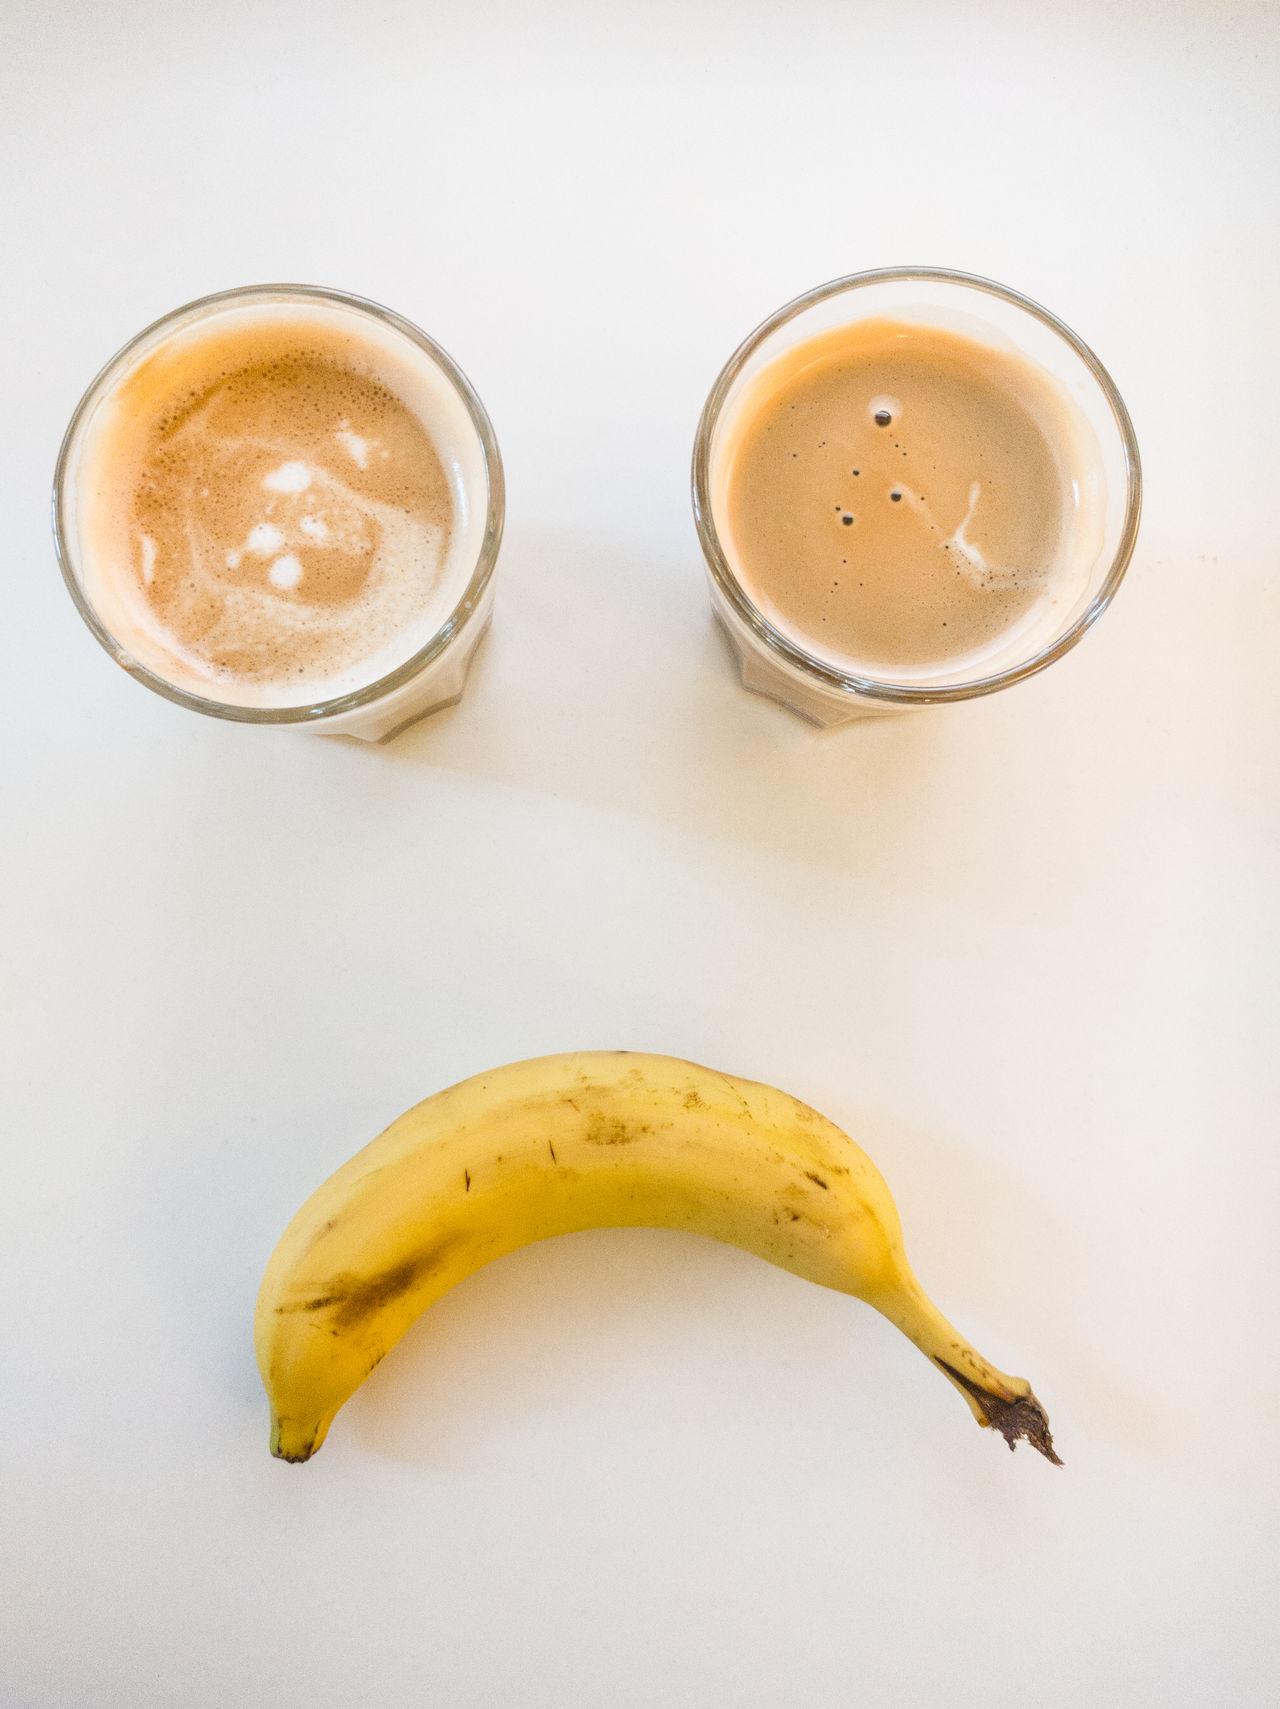 Beautiful stock photos of banana,  Banana,  Berlin,  Coffee - Drink,  Depression - Sadness